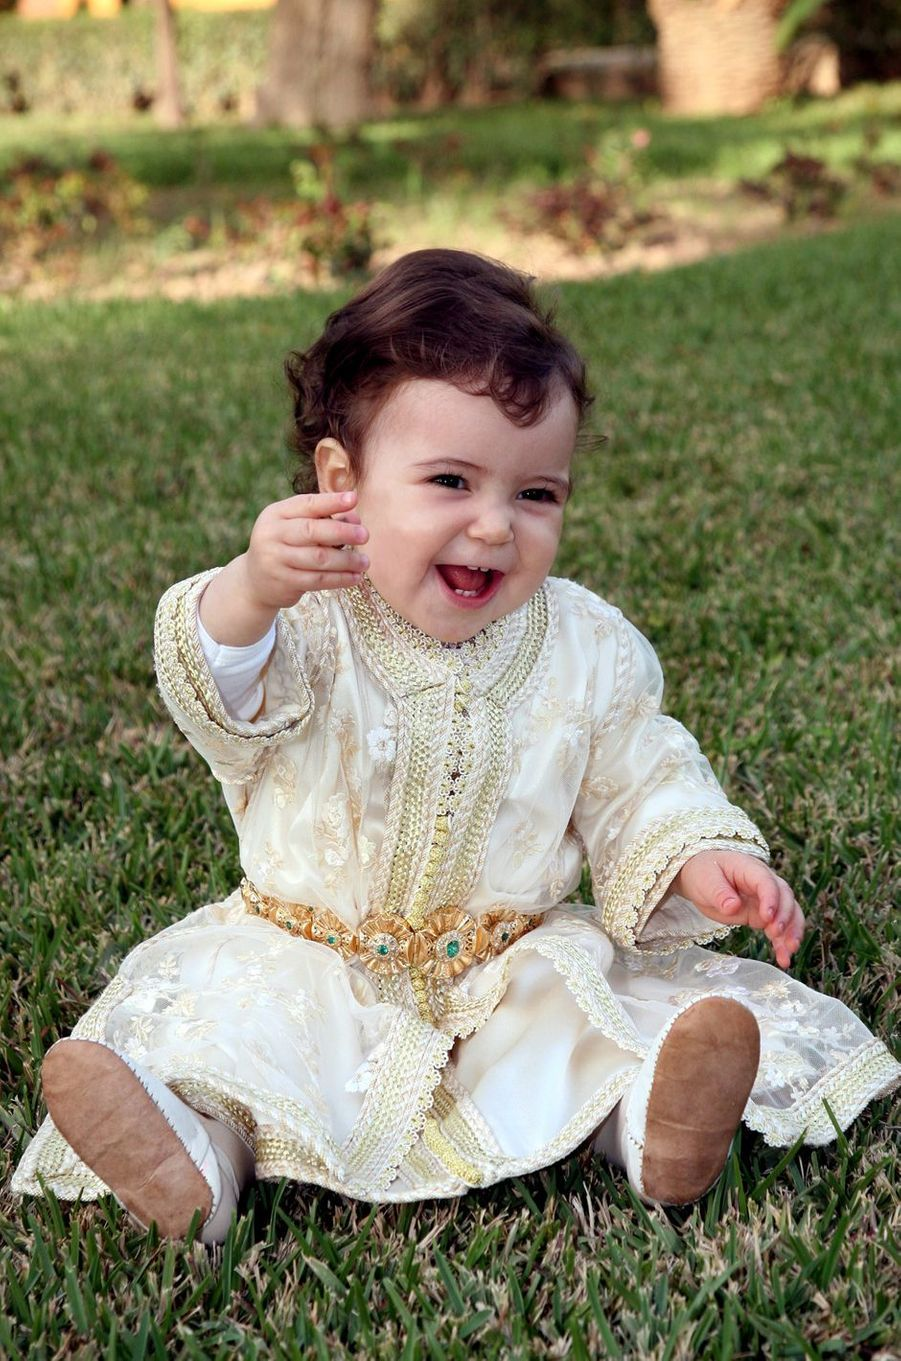 La princesse Lalla Khadija du Maroc, le 28 février 2008